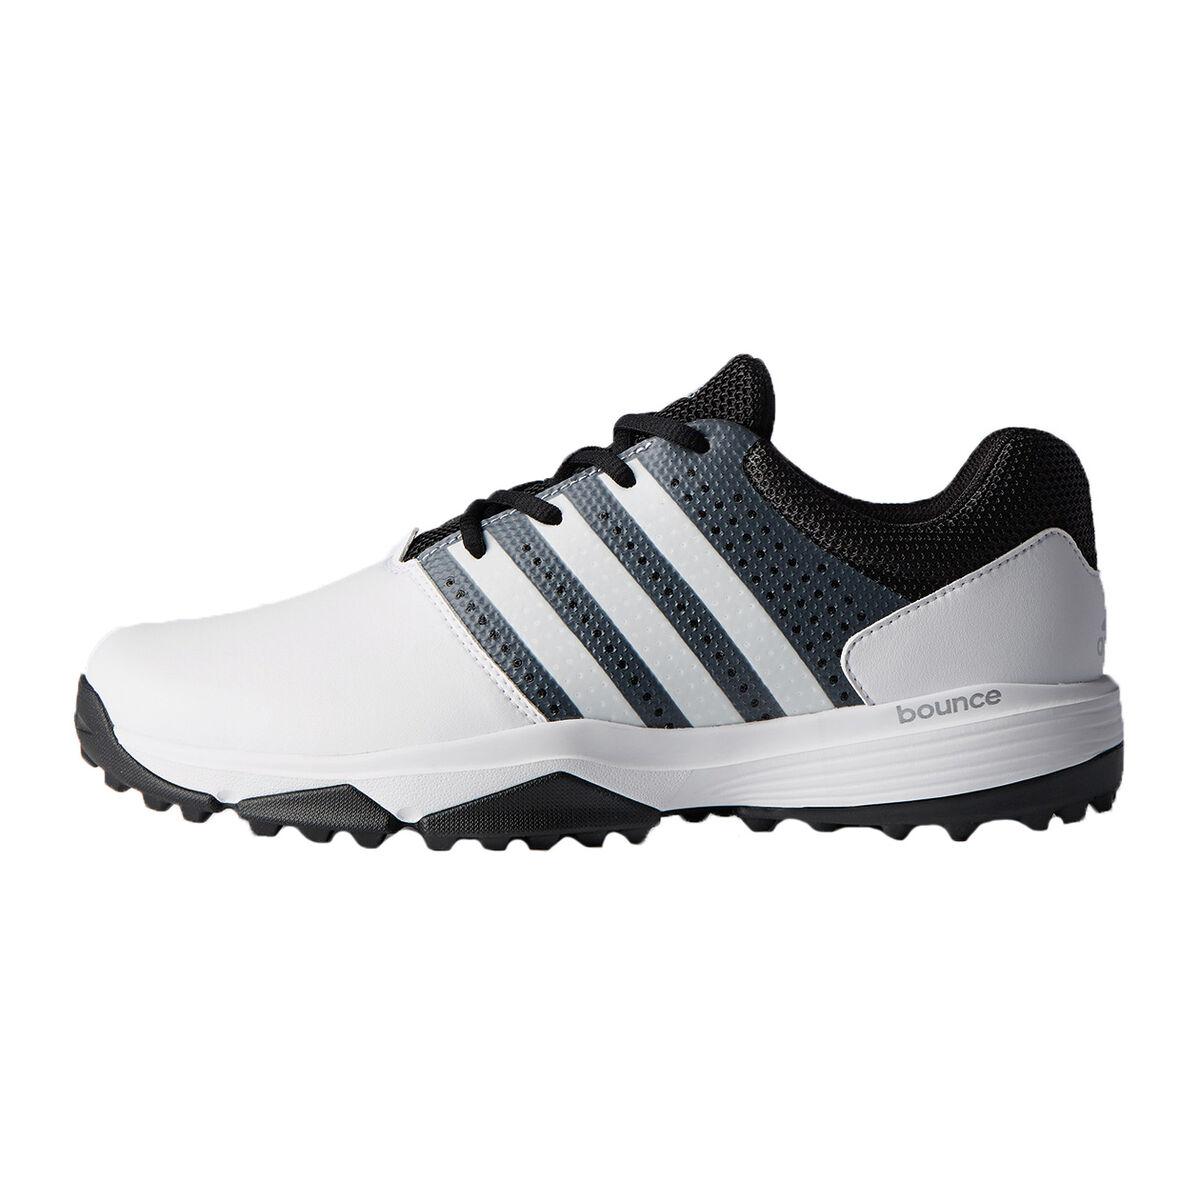 buy online dce14 f29d0 adidas 360 TRAXION Mens Golf Shoe - WhiteBlackPGA TOUR Super